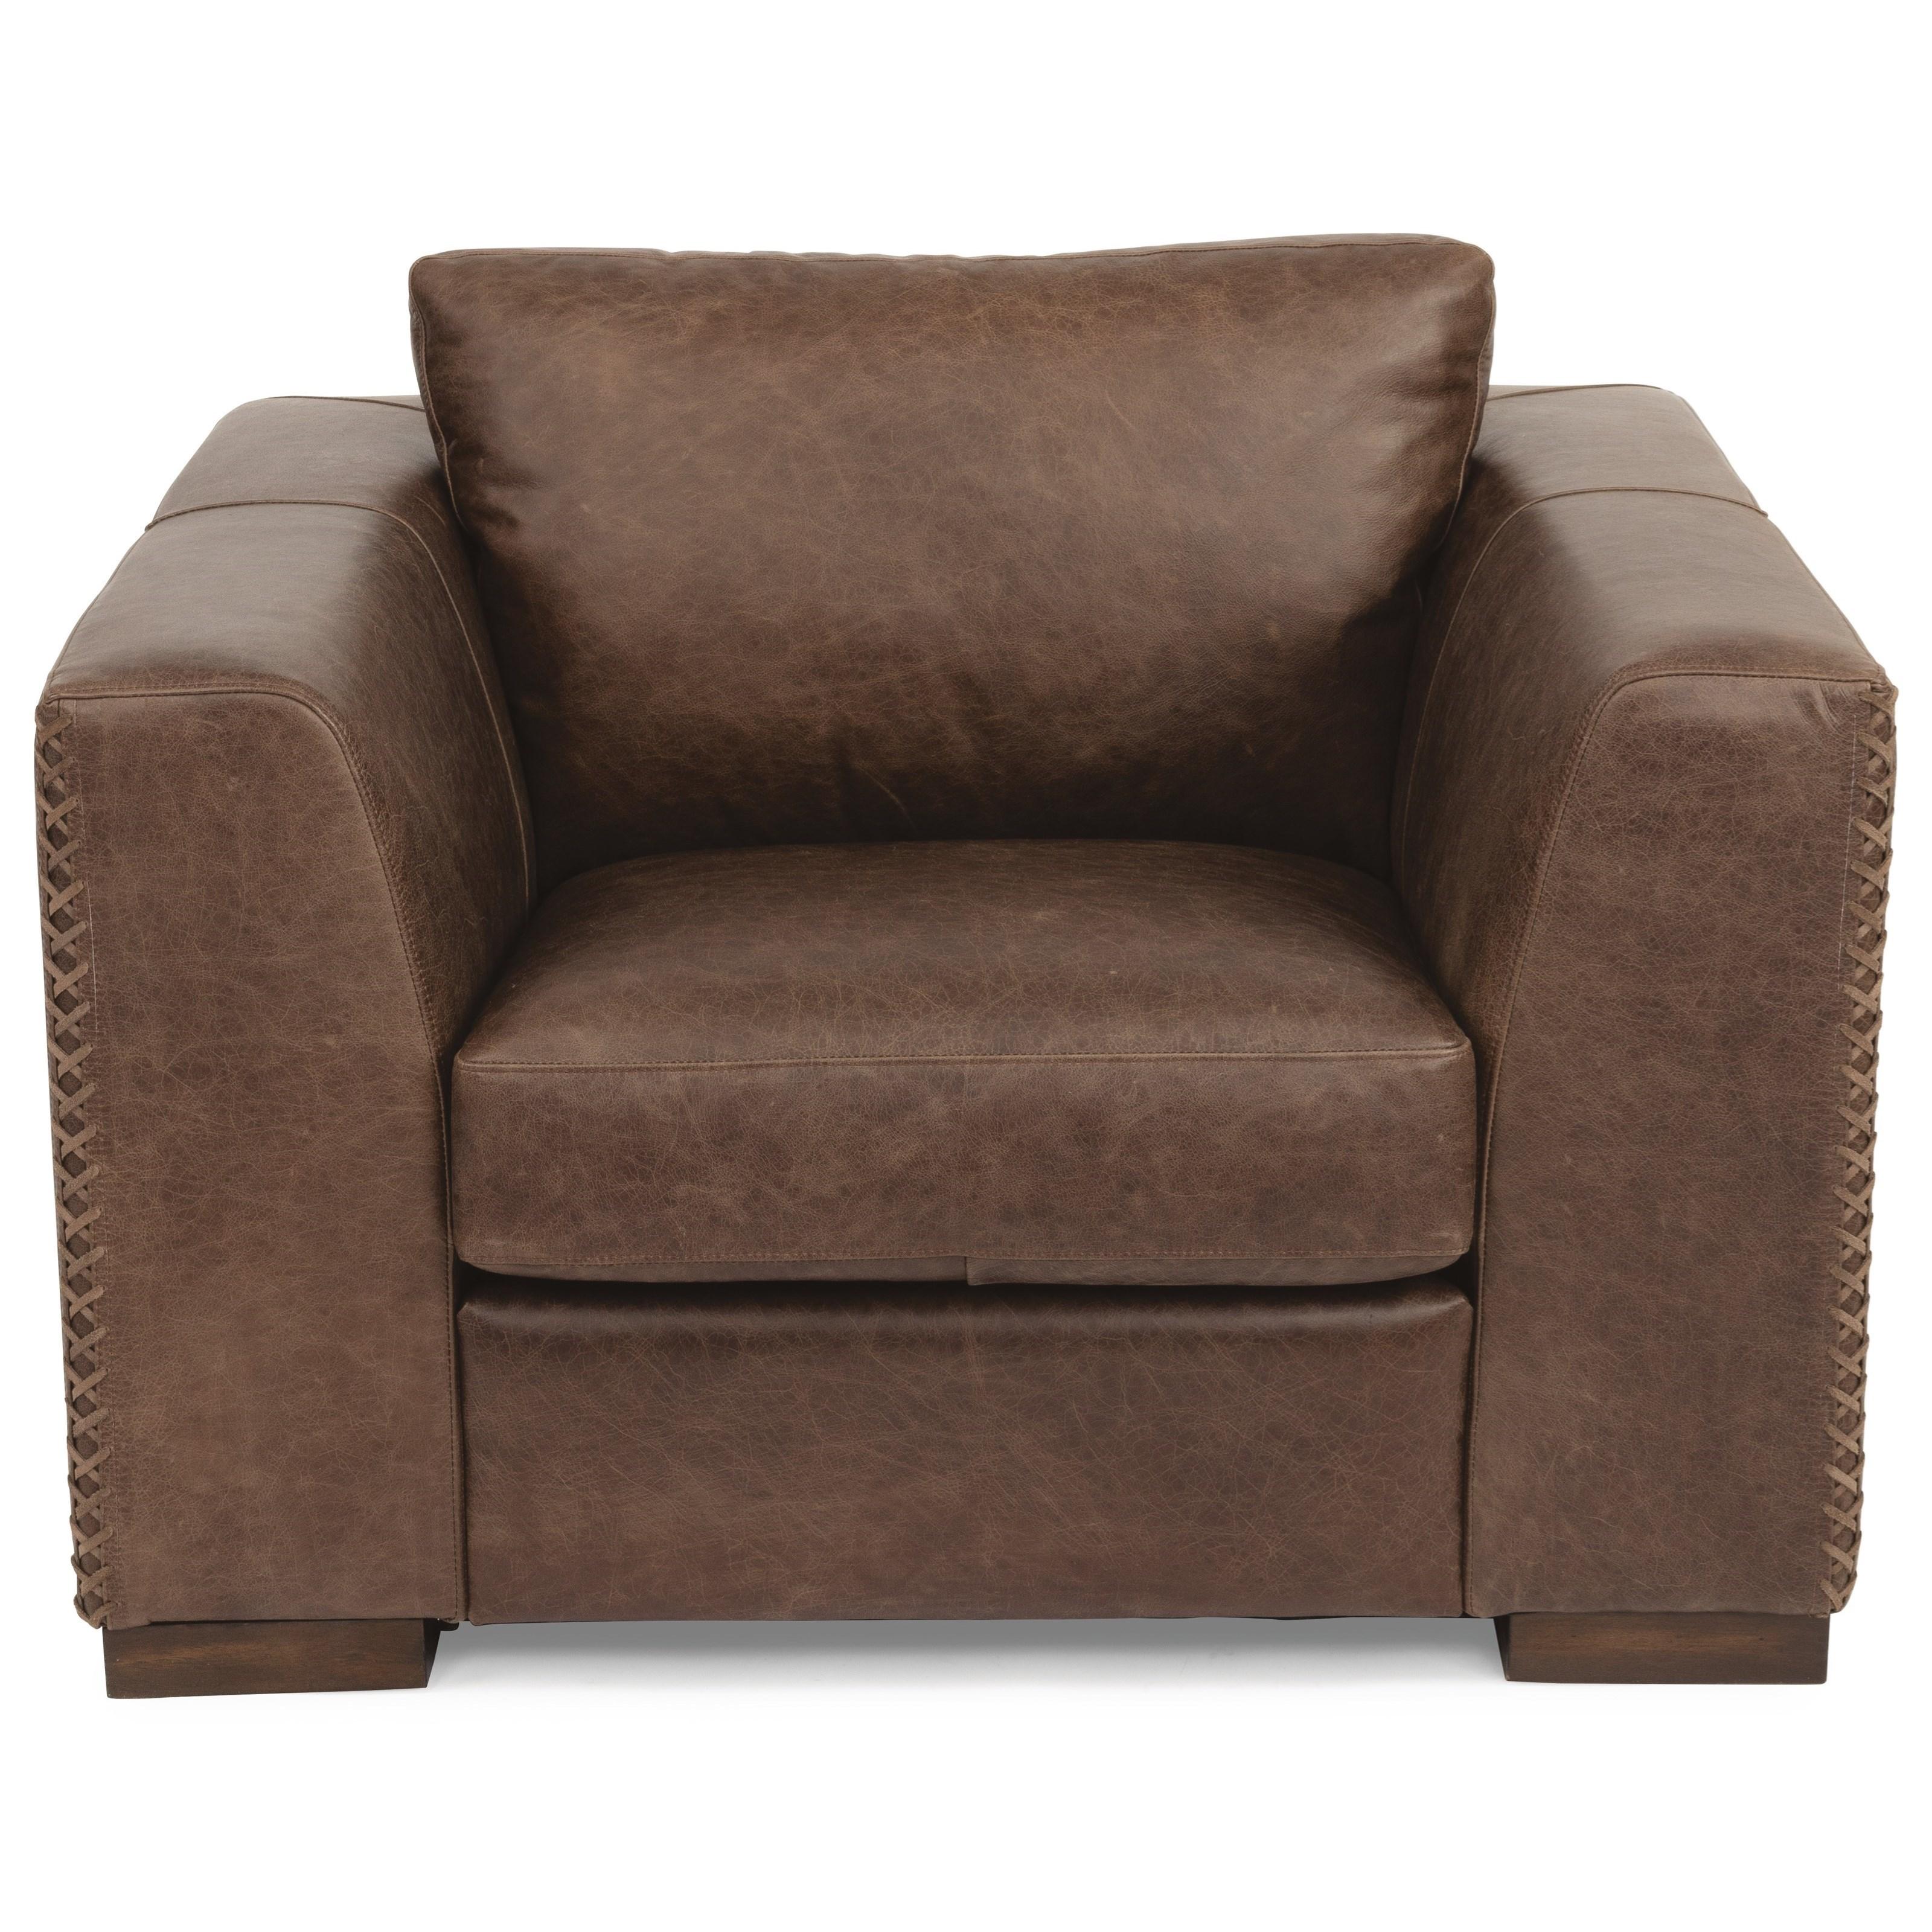 Latitudes - Hawkins Upholstered Chair  by Flexsteel at Walker's Furniture